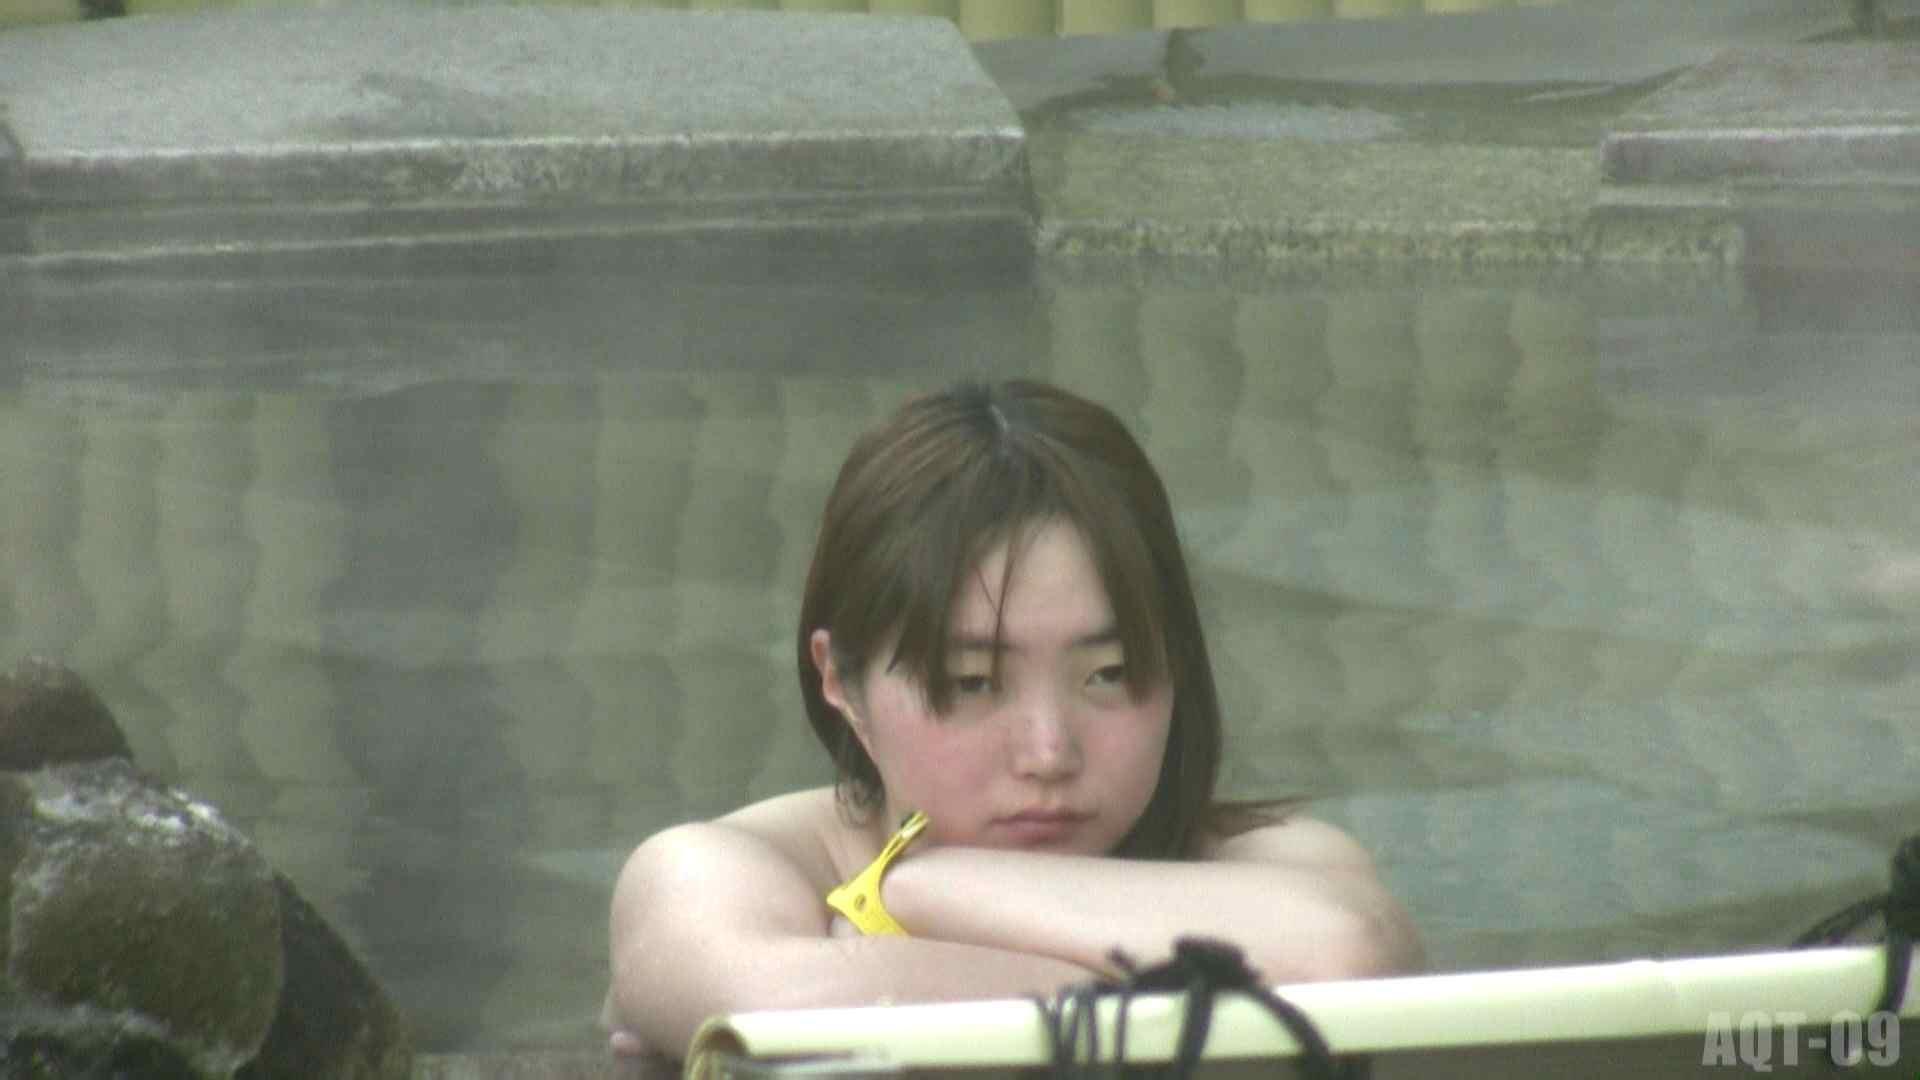 Aquaな露天風呂Vol.781 0  48連発 38